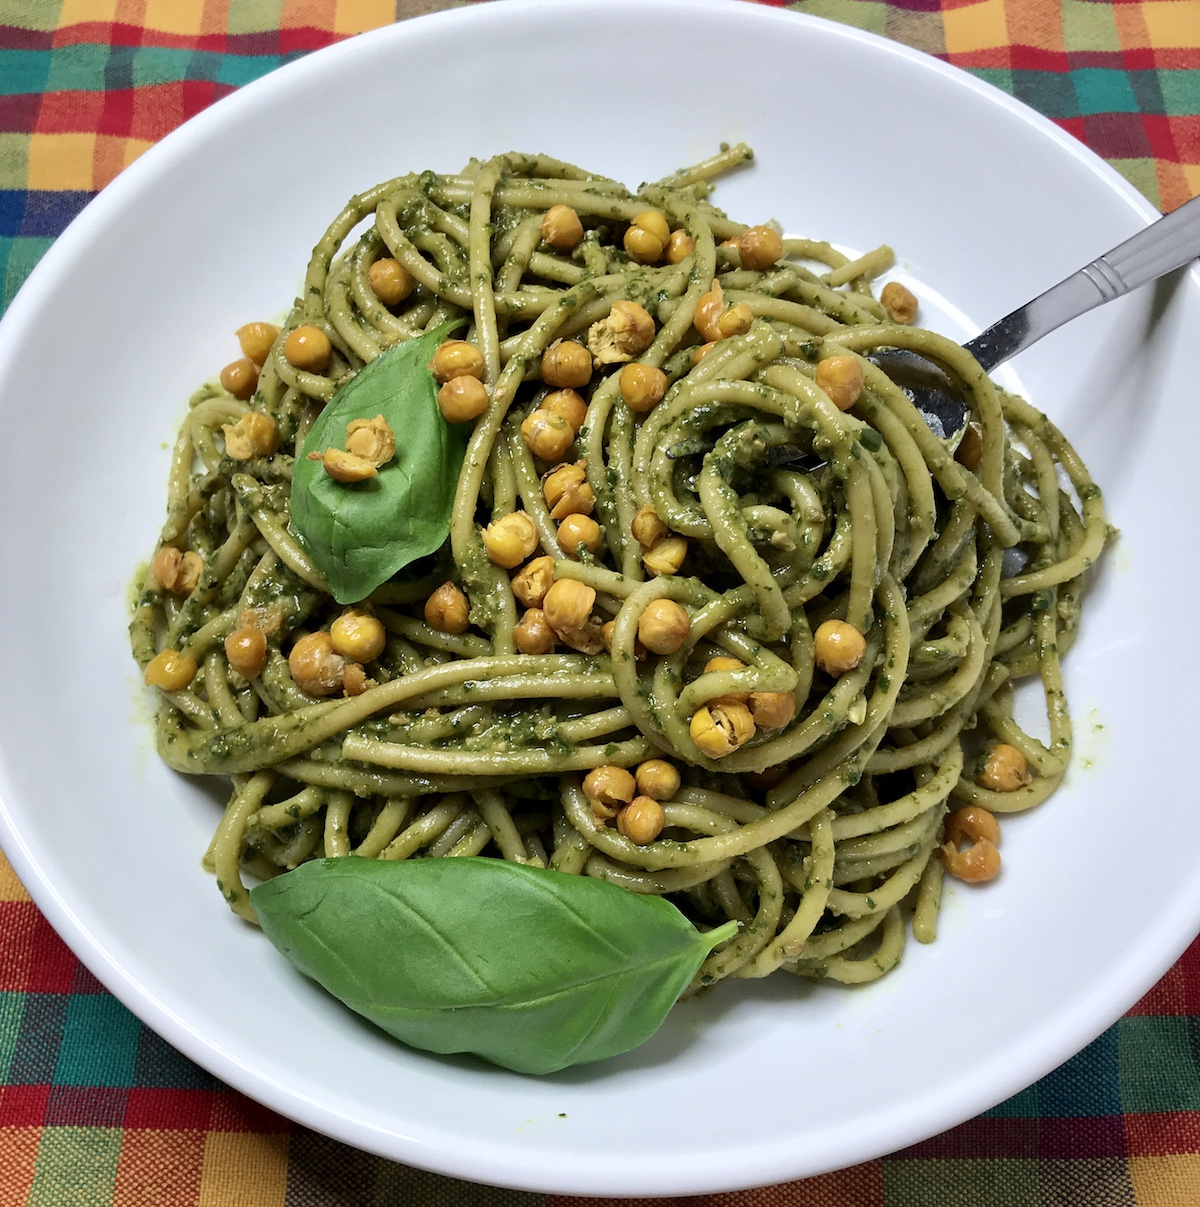 Greenpoint Cookbook: @NYCVeganMom's Vegan Pesto with Chickpeas